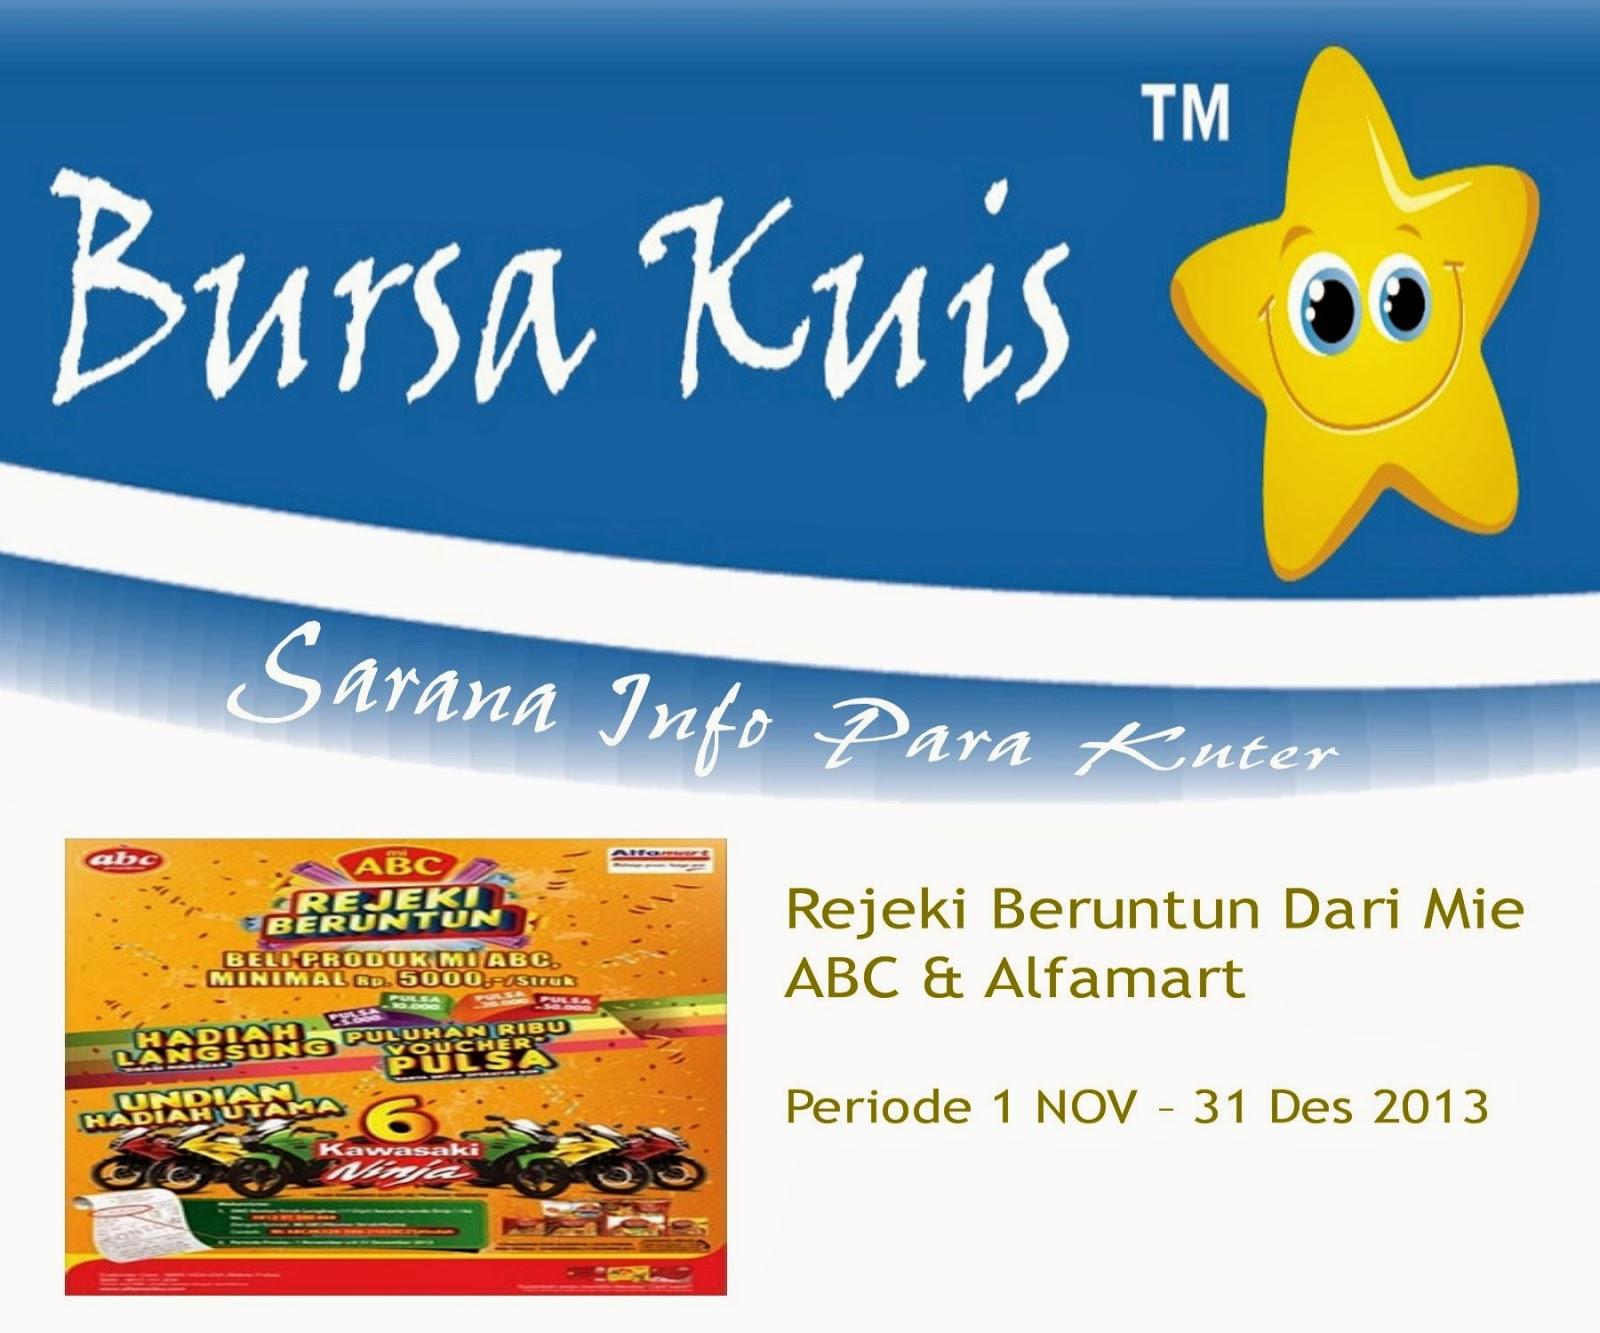 Rejeki Beruntun Mie ABC & Alfamart